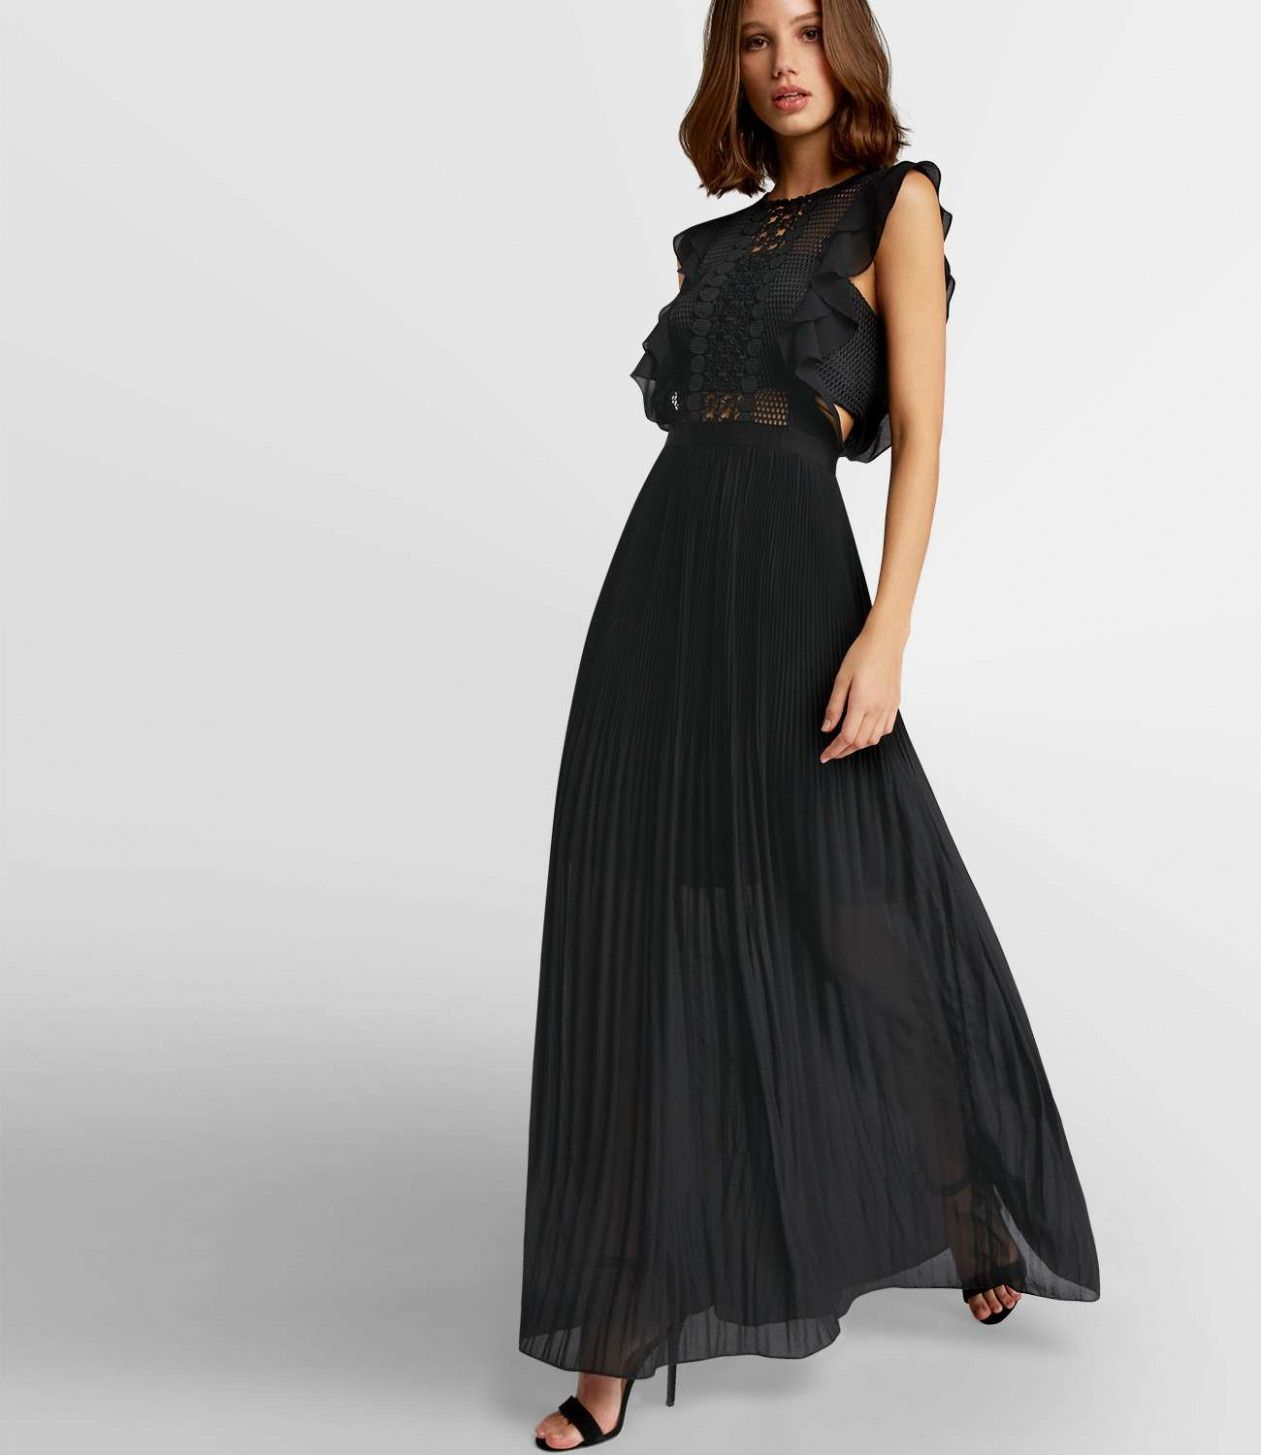 15 langes abendkleid schwarz | abendkleid, abendkleid